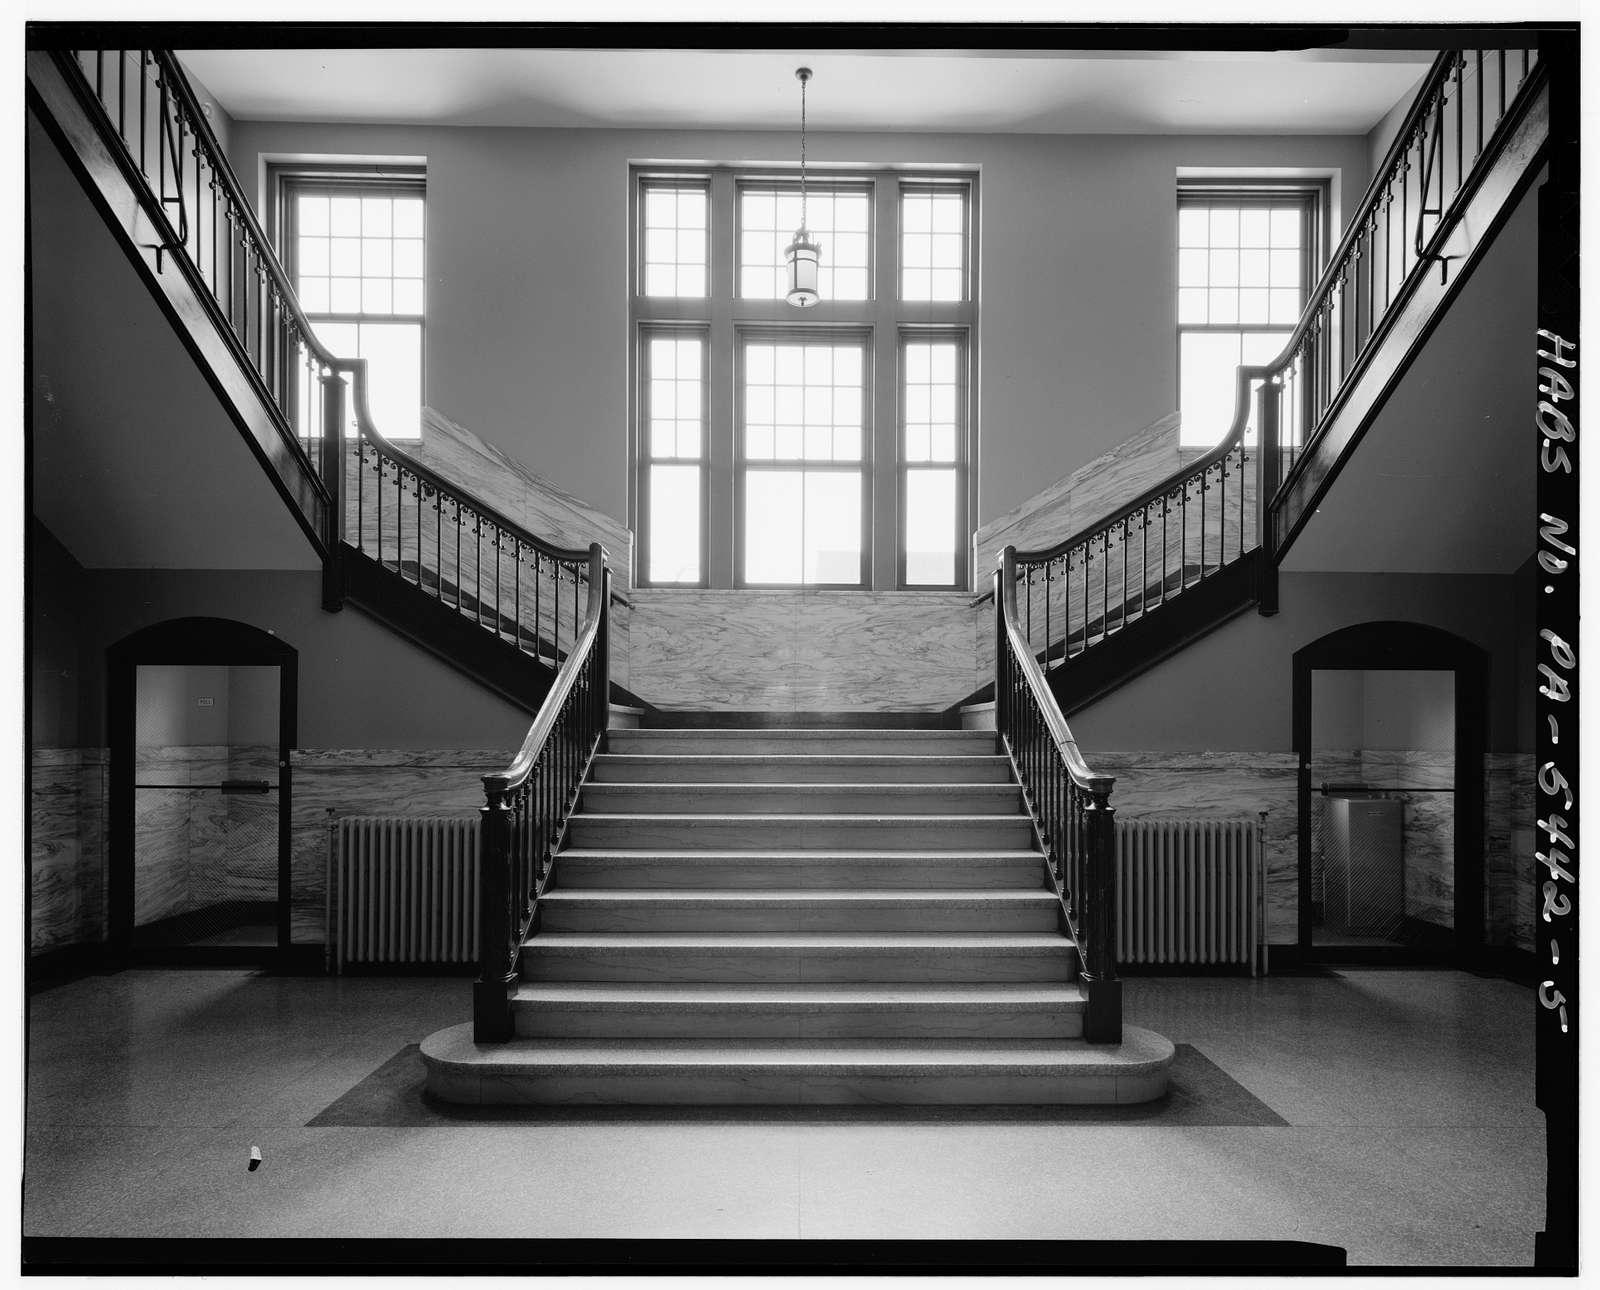 Gettysburg College, Glatfelder Hall, Old Quadrangle, West side, Gettysburg, Adams County, PA